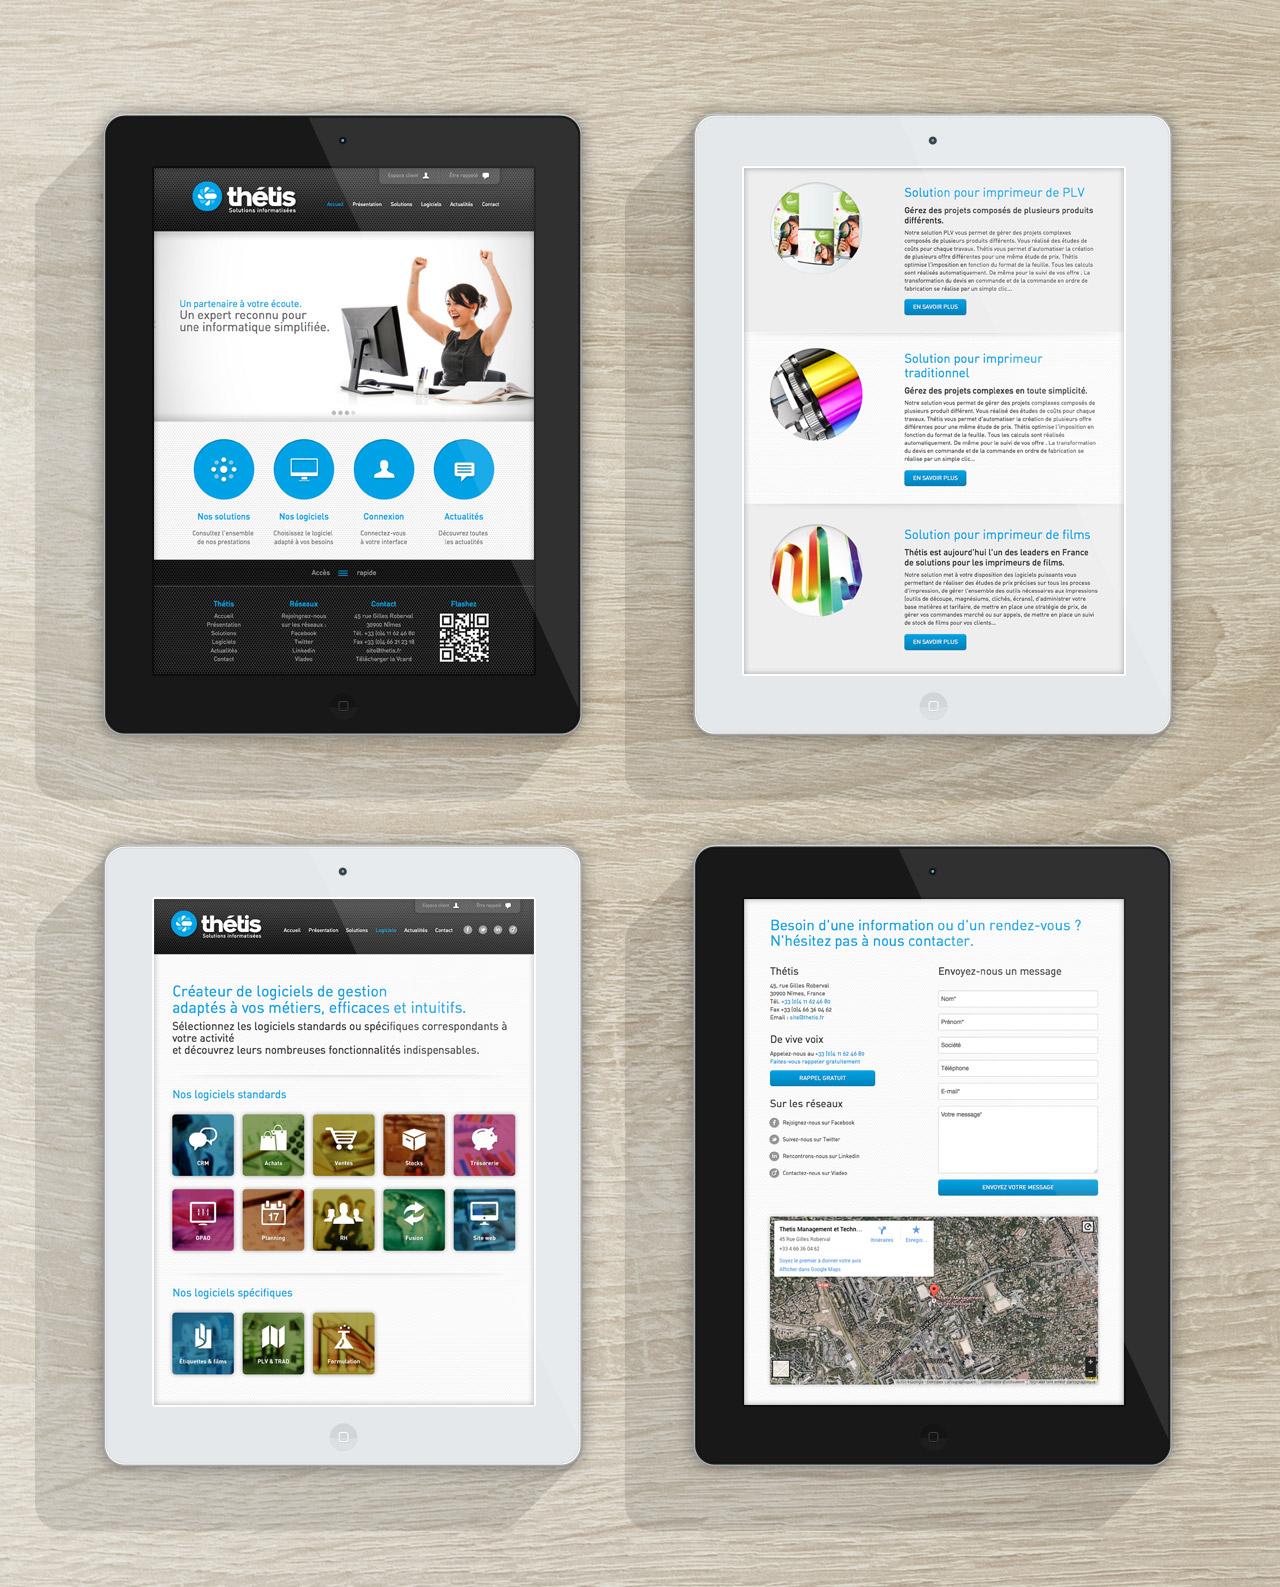 thetis-site-web-responsive-design-creation-communication-caconcept-alexis-cretin-graphiste